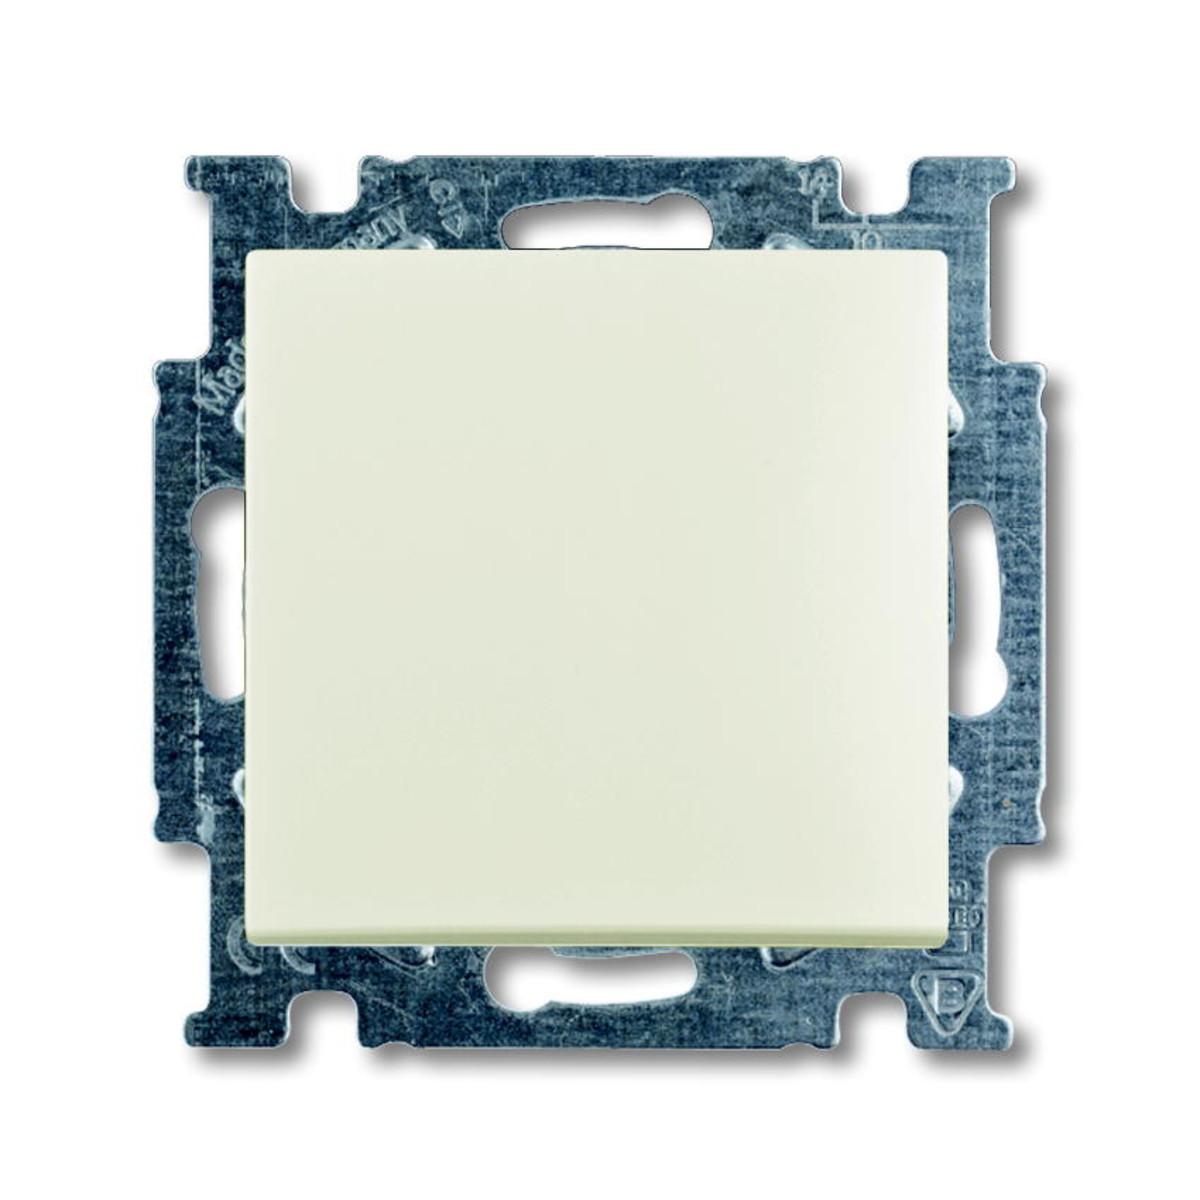 Выключатель ABB Basic 55 2006/7 UC-96-5